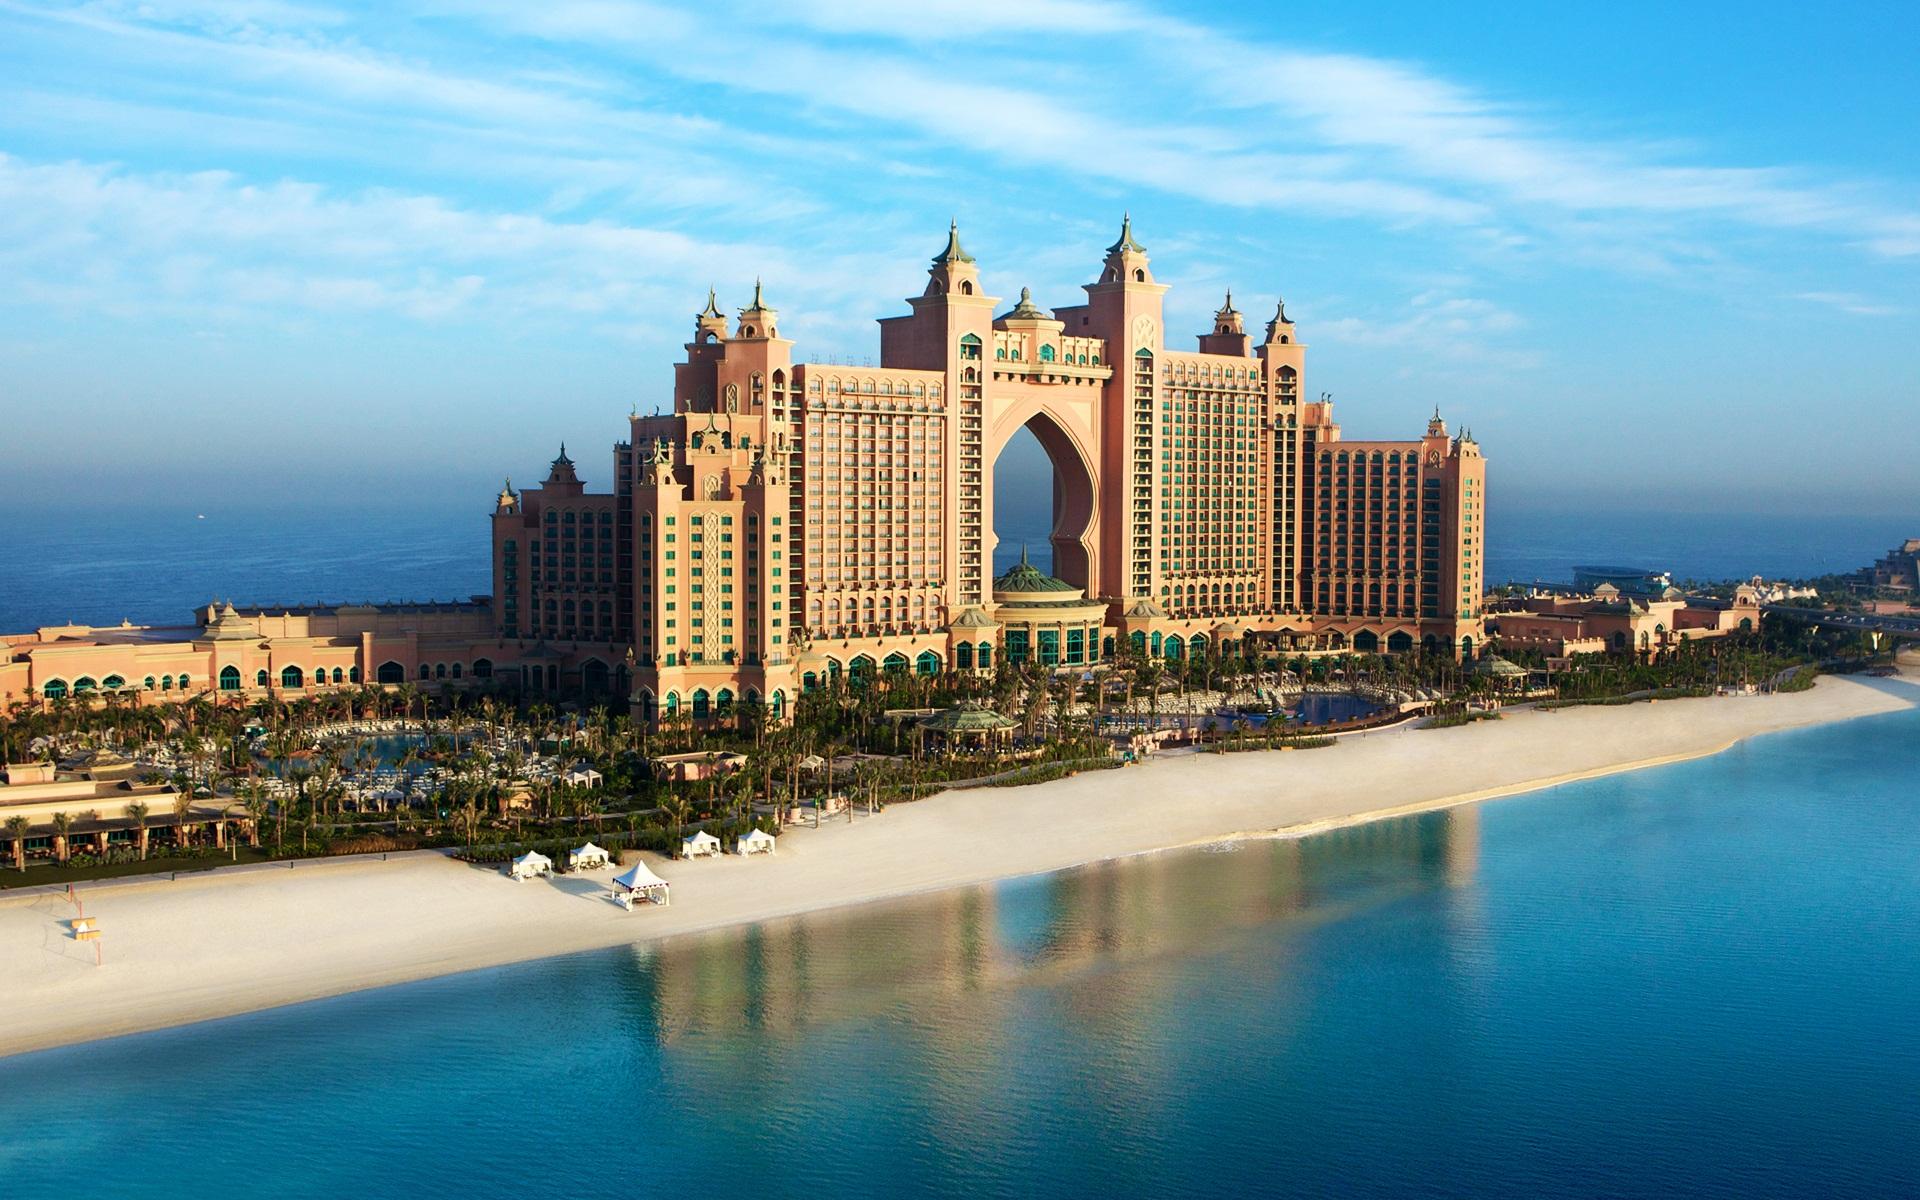 Atlantis The Palm Dubai Wallpapers HD Wallpapers 1920x1200